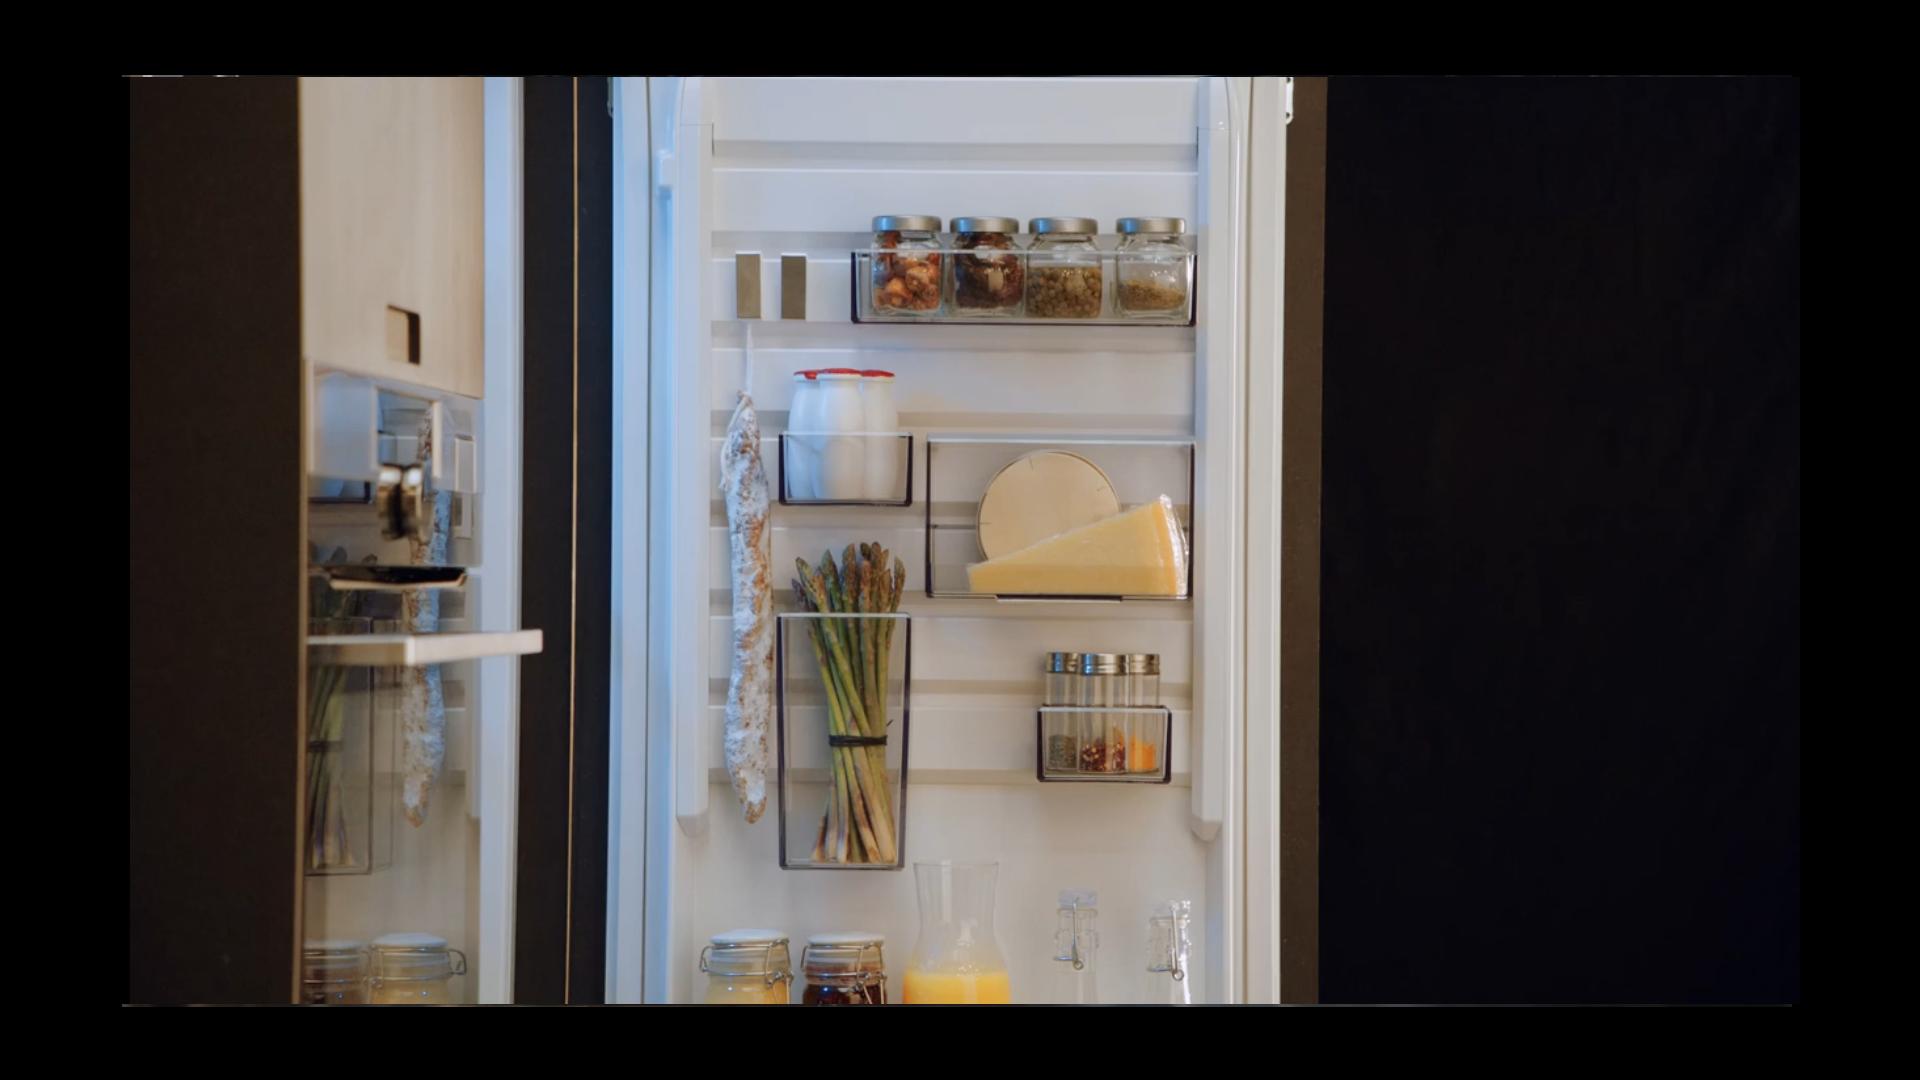 Aeg Hausgeräte Kühlschrank : Aeg kühlschrank mit customflex elektro pöppel hausgeräte und